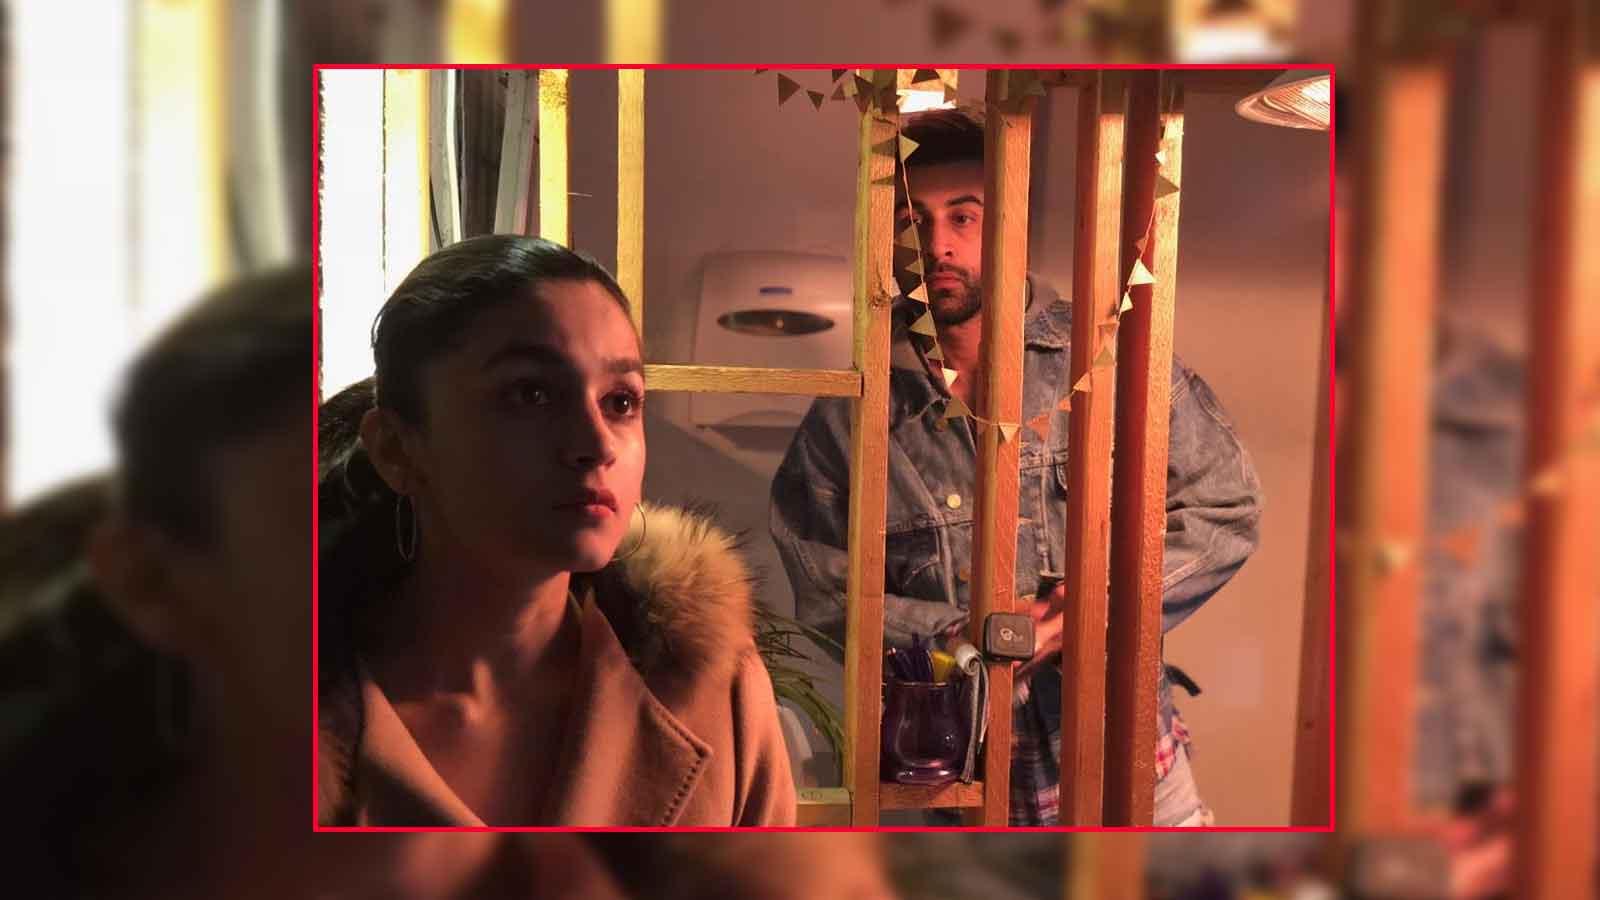 'Brahmastra' sets: Ranbir Kapoor cannot take his eyes off ladylove Alia Bhatt